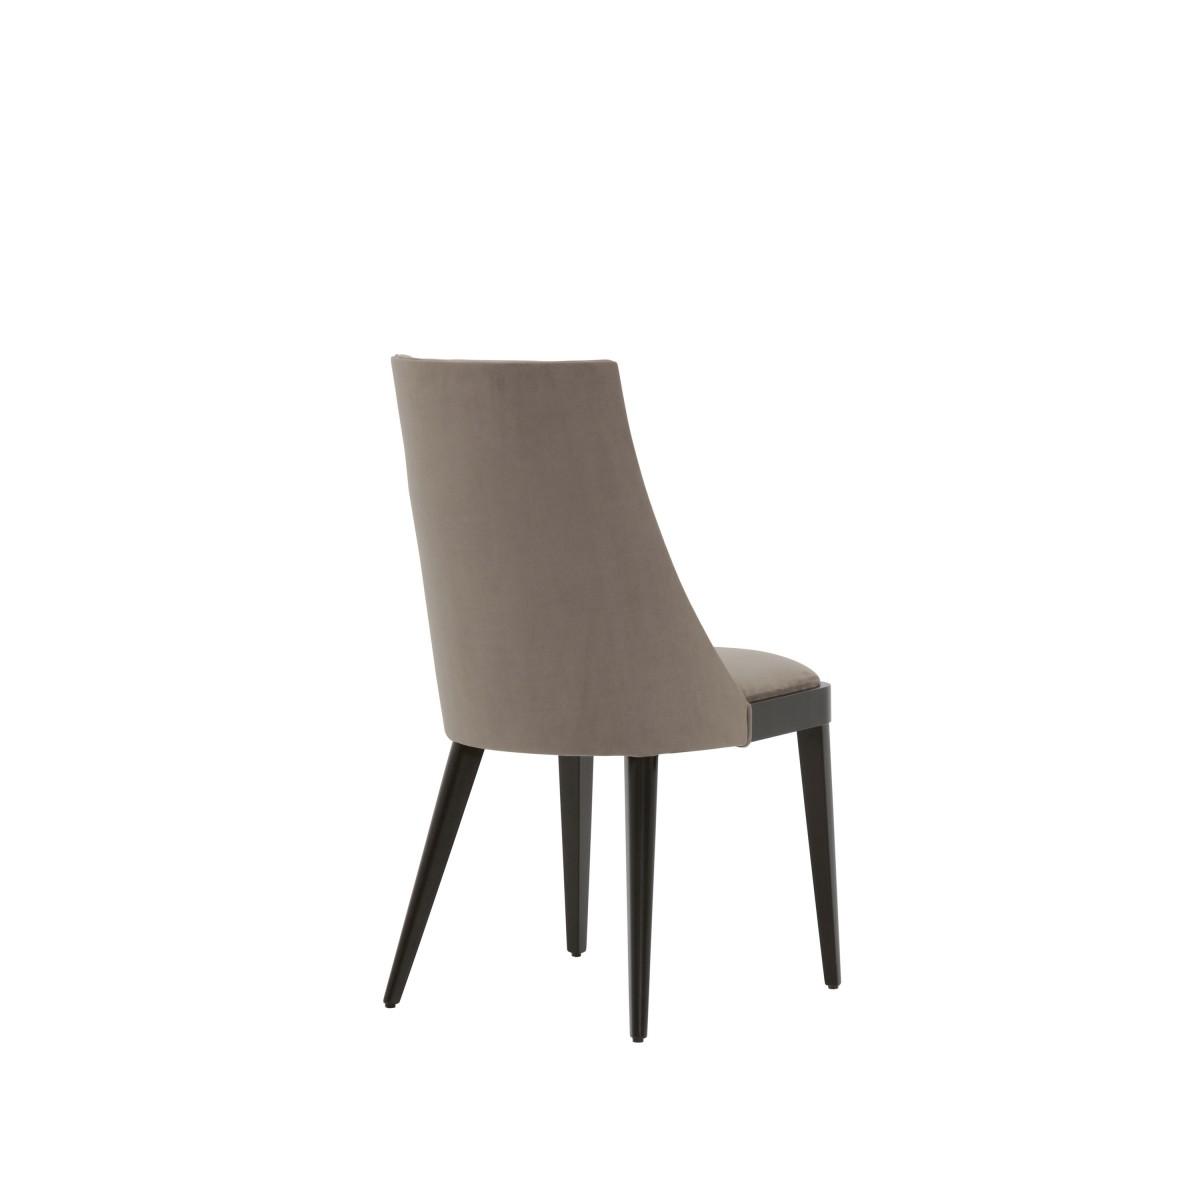 6652 modern style wood chair norvegia3